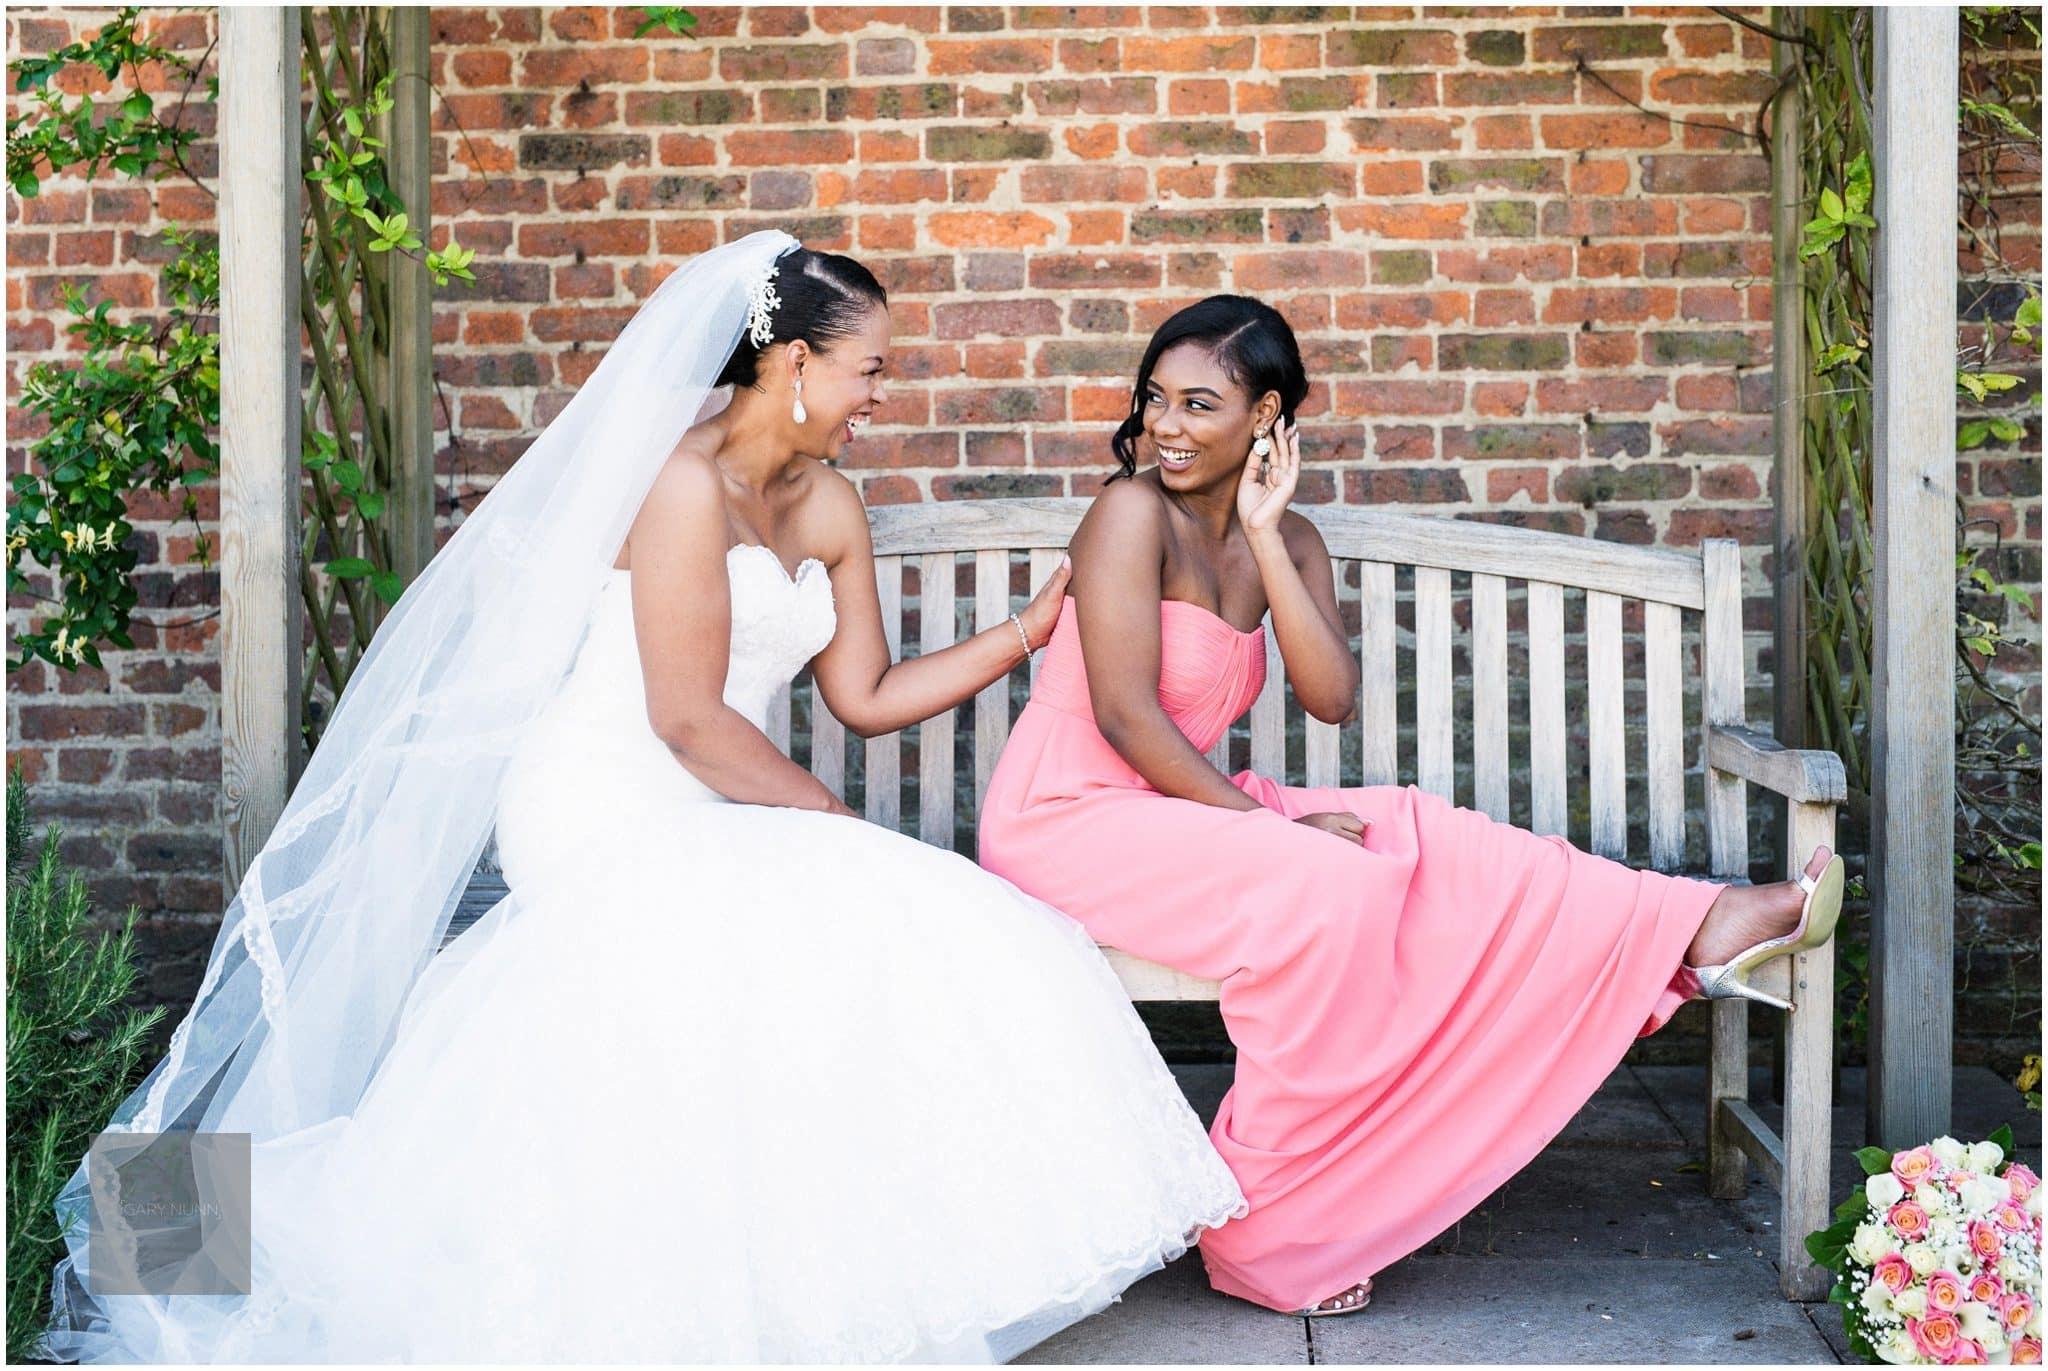 Wedding Photographer Milton Keynes, Wedding Photography Milton Keynes, Woburn Sculpture Gallery Weddings